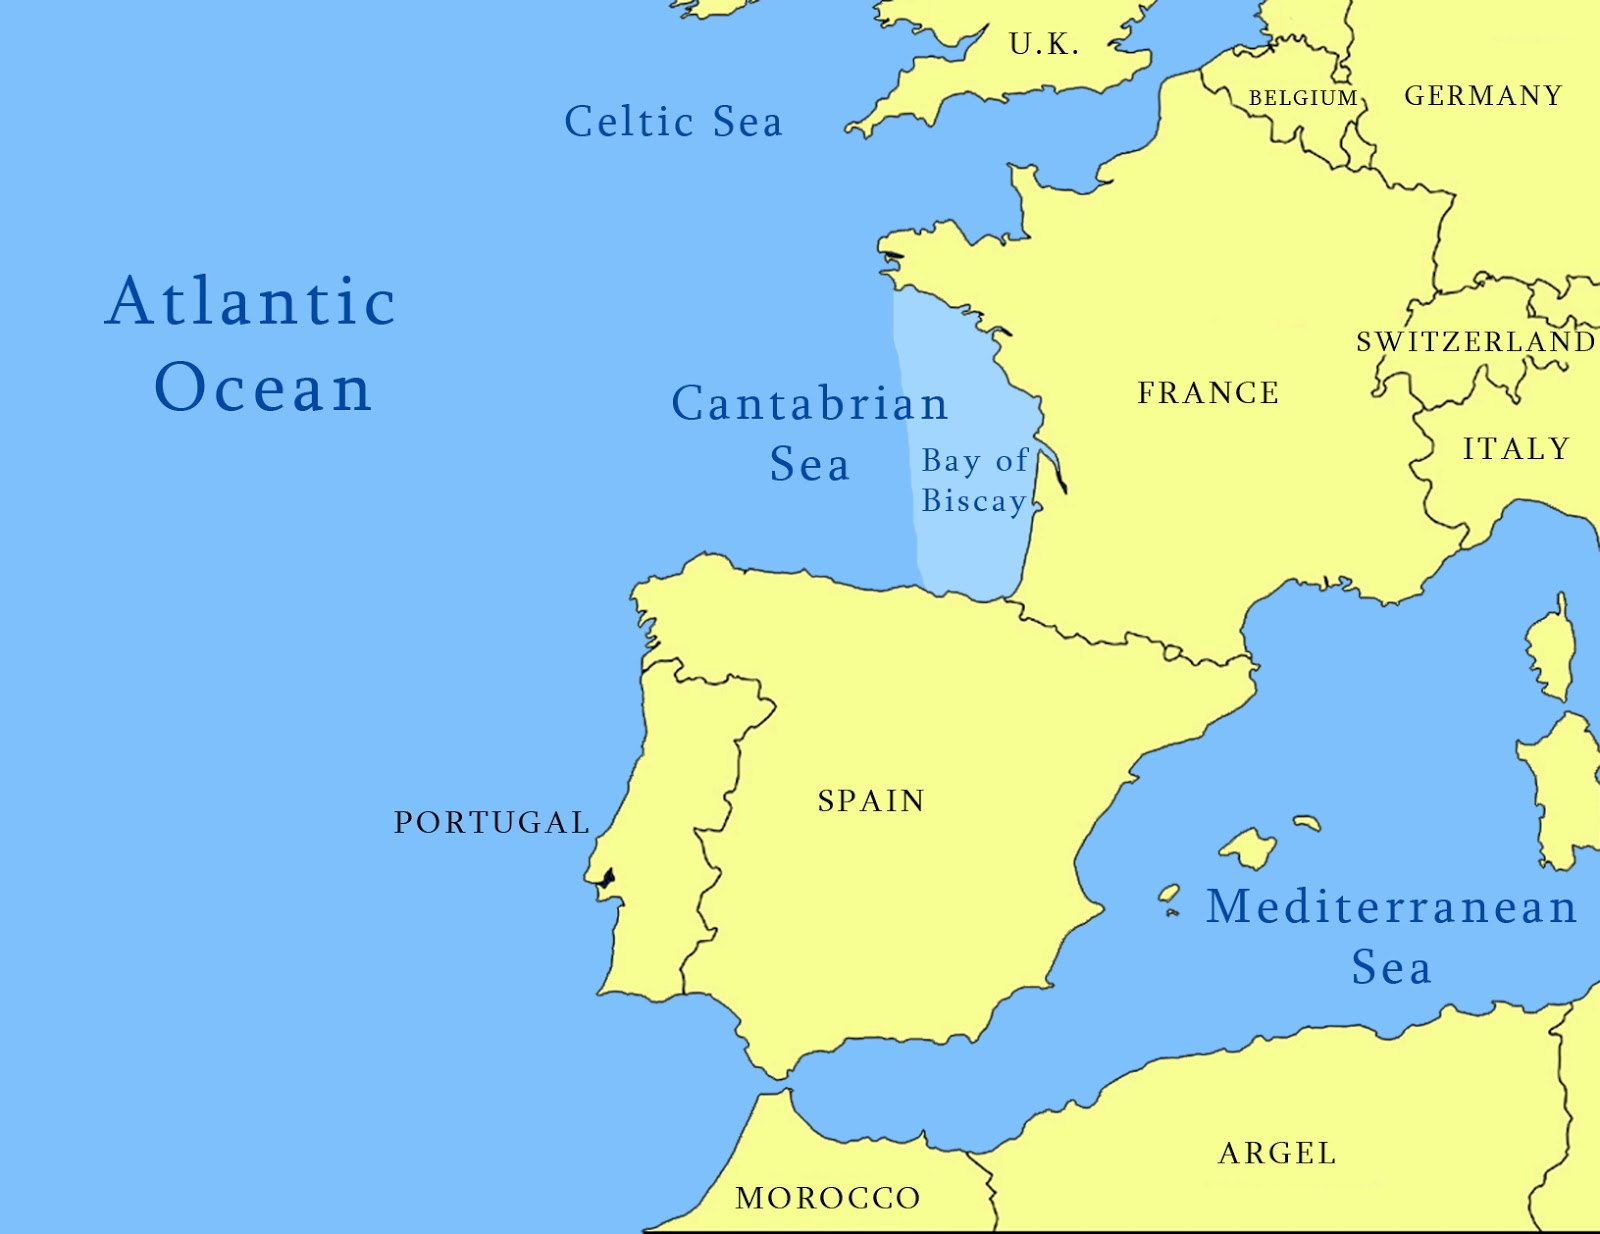 mapa de tx with Golfo De Vizcaya Versus Mar Cantabrico on Citymap furthermore Las Iglesias Catolicas Mas Grandes Del Mundo further Mexico texas 1845 also Shanghai Street Map additionally Texas County Map.